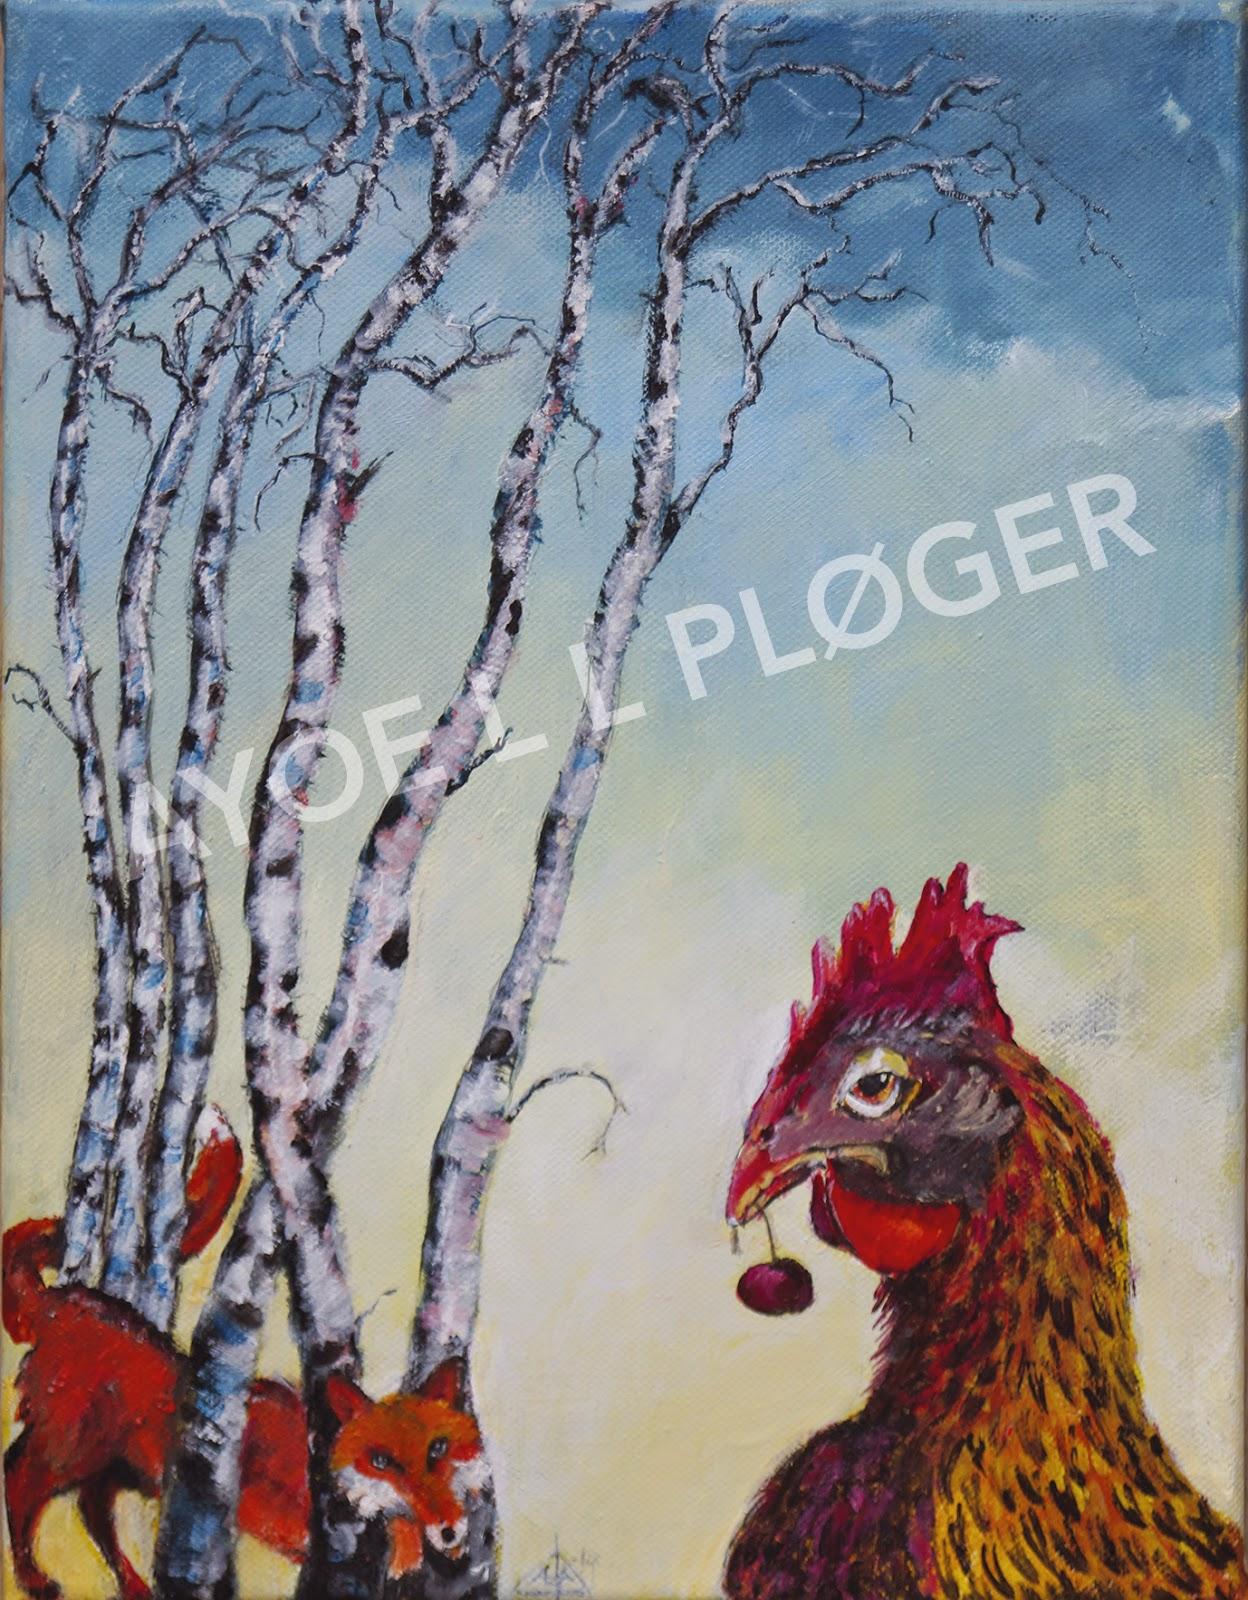 Høne, birketrær, kunst, moderne, ræv, acryl, maleri, fox, hen, chiken